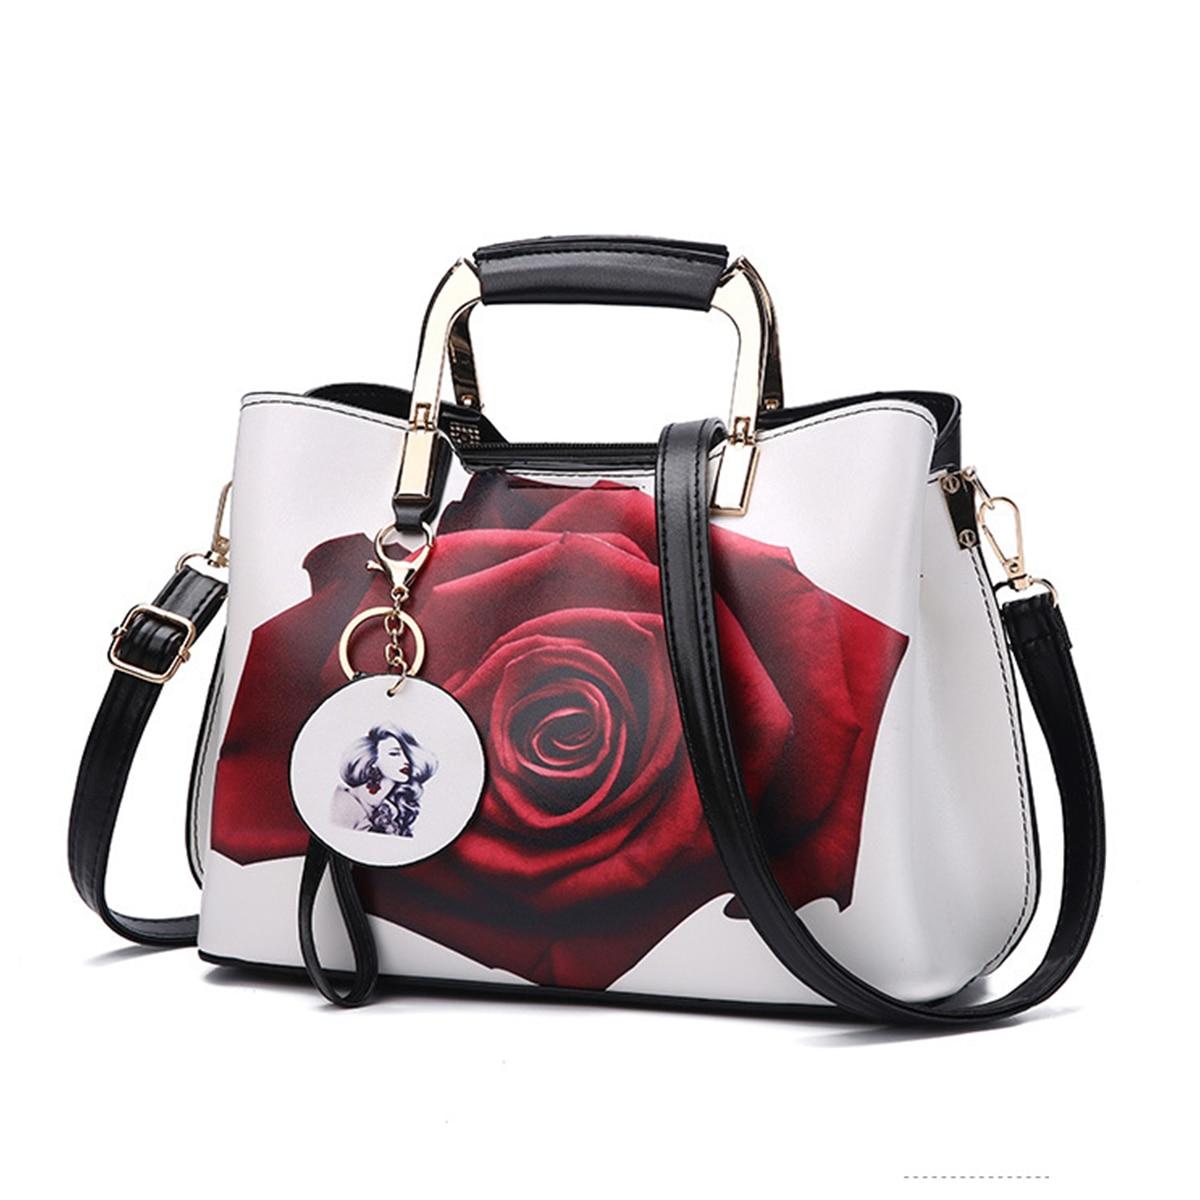 Women Handbag Leather Shell Women Shoulder Bag Crossbody Handbag Girls Pendant Big Elegant Luxury Handbags Women Bags Designer